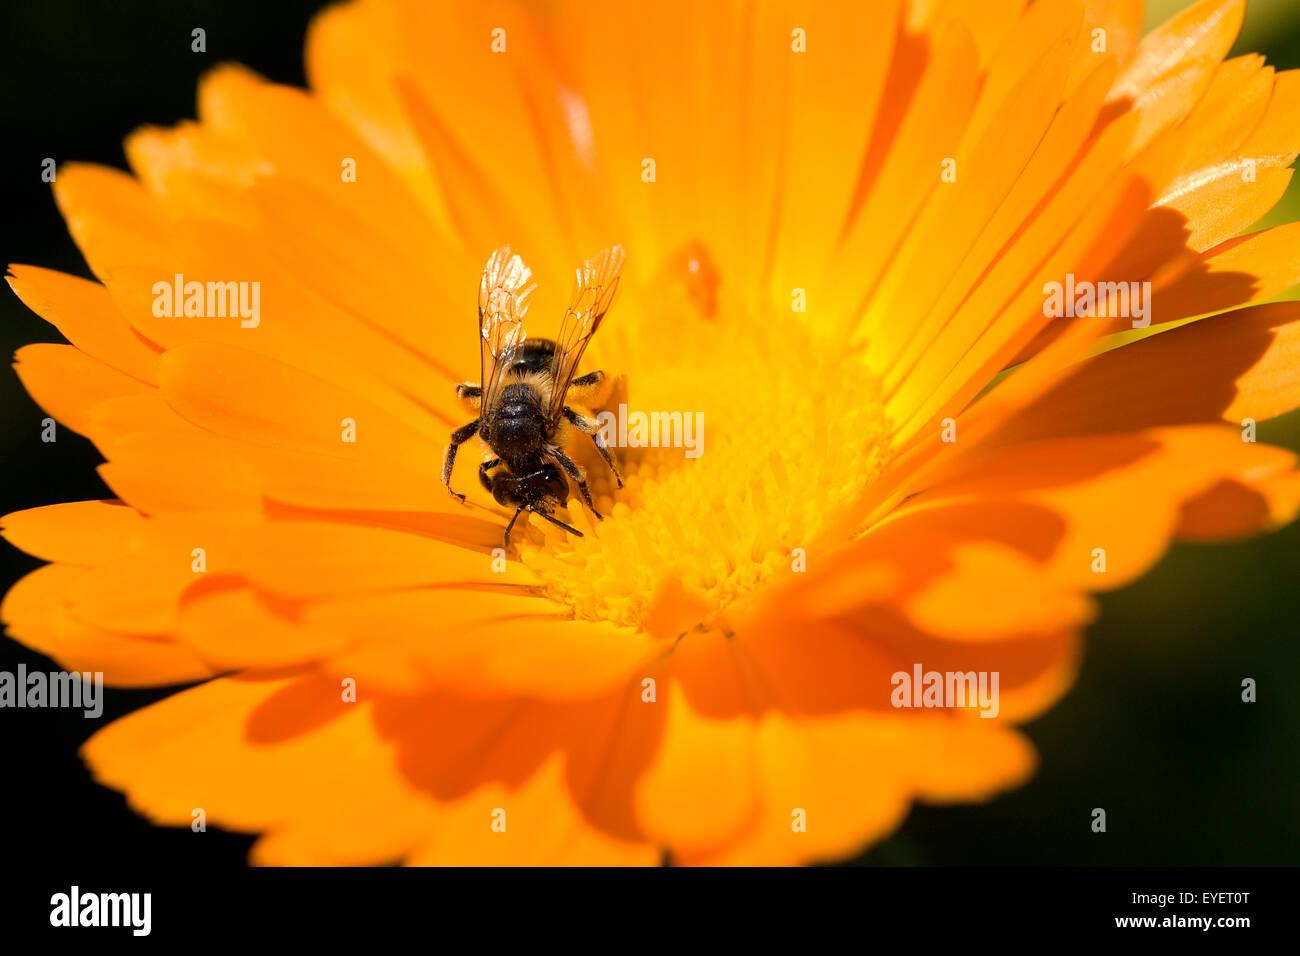 Ringelblume; Calendula Officinalis; Wildbiene - Stock Image